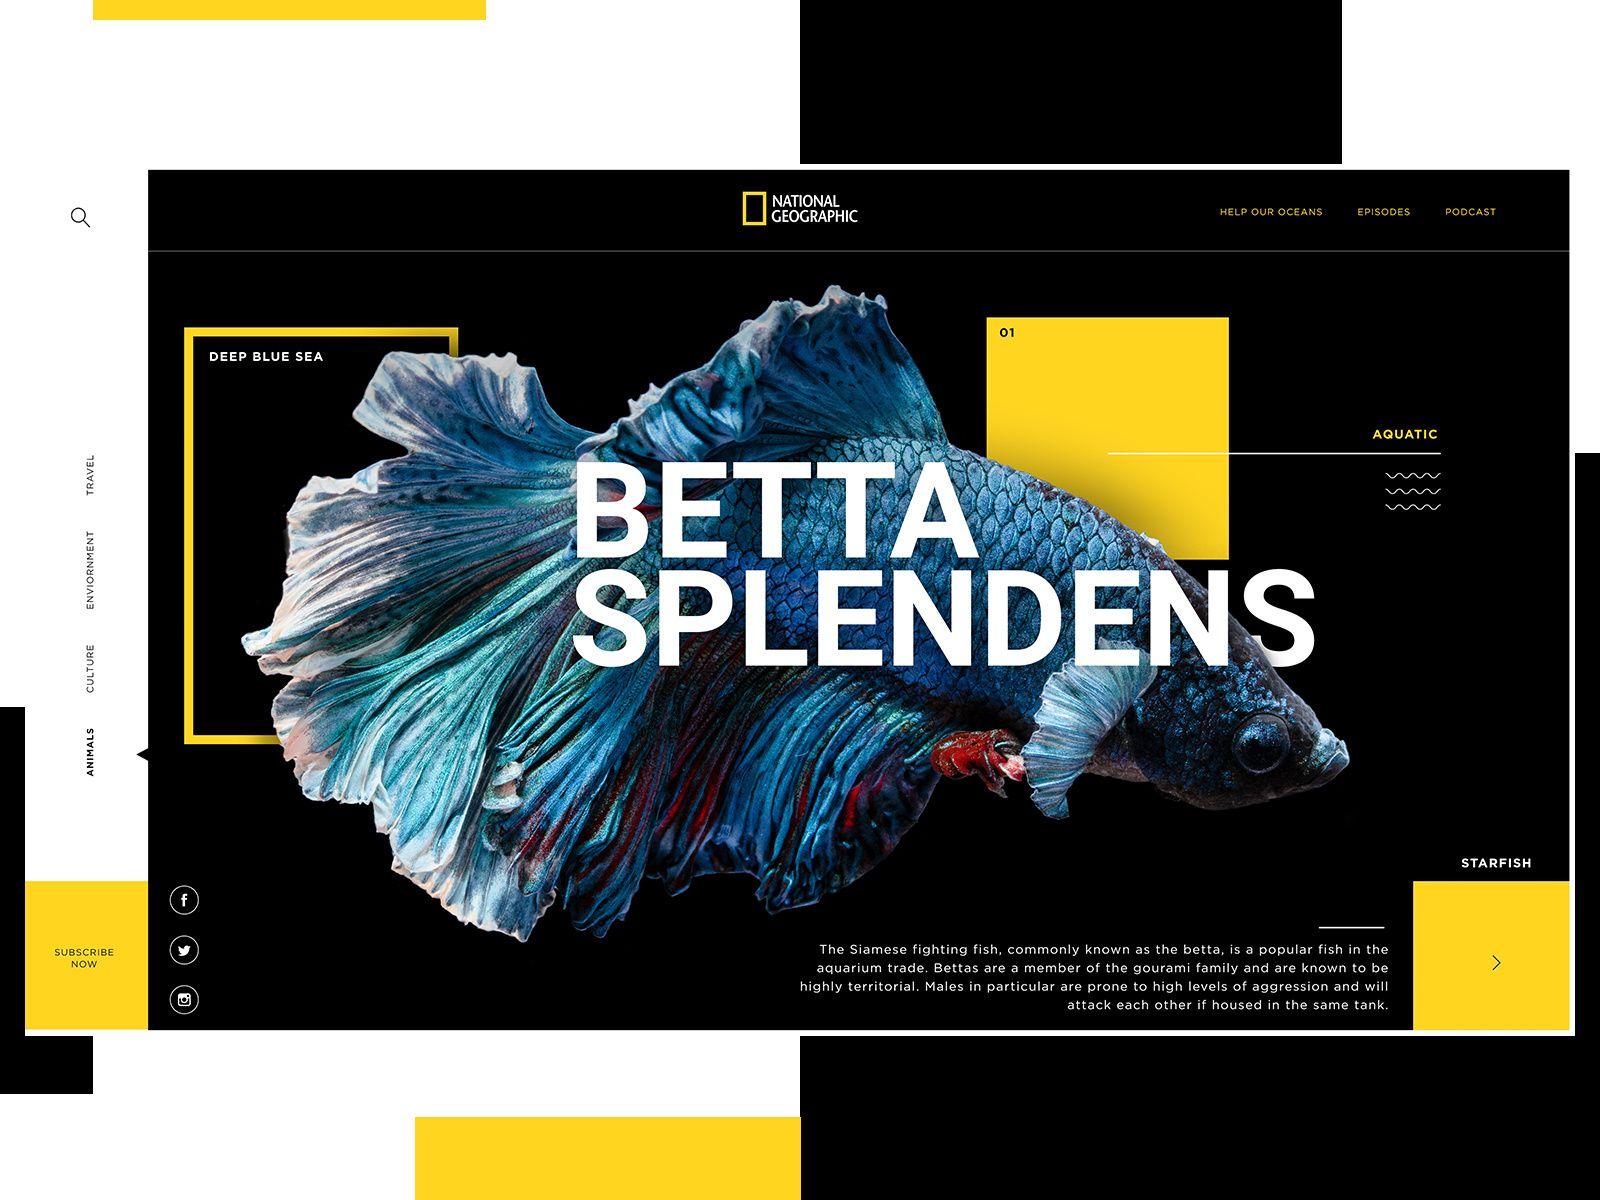 National Geographic Website Design Concept Creative Website Design Inspiration Webpage Design Website Design